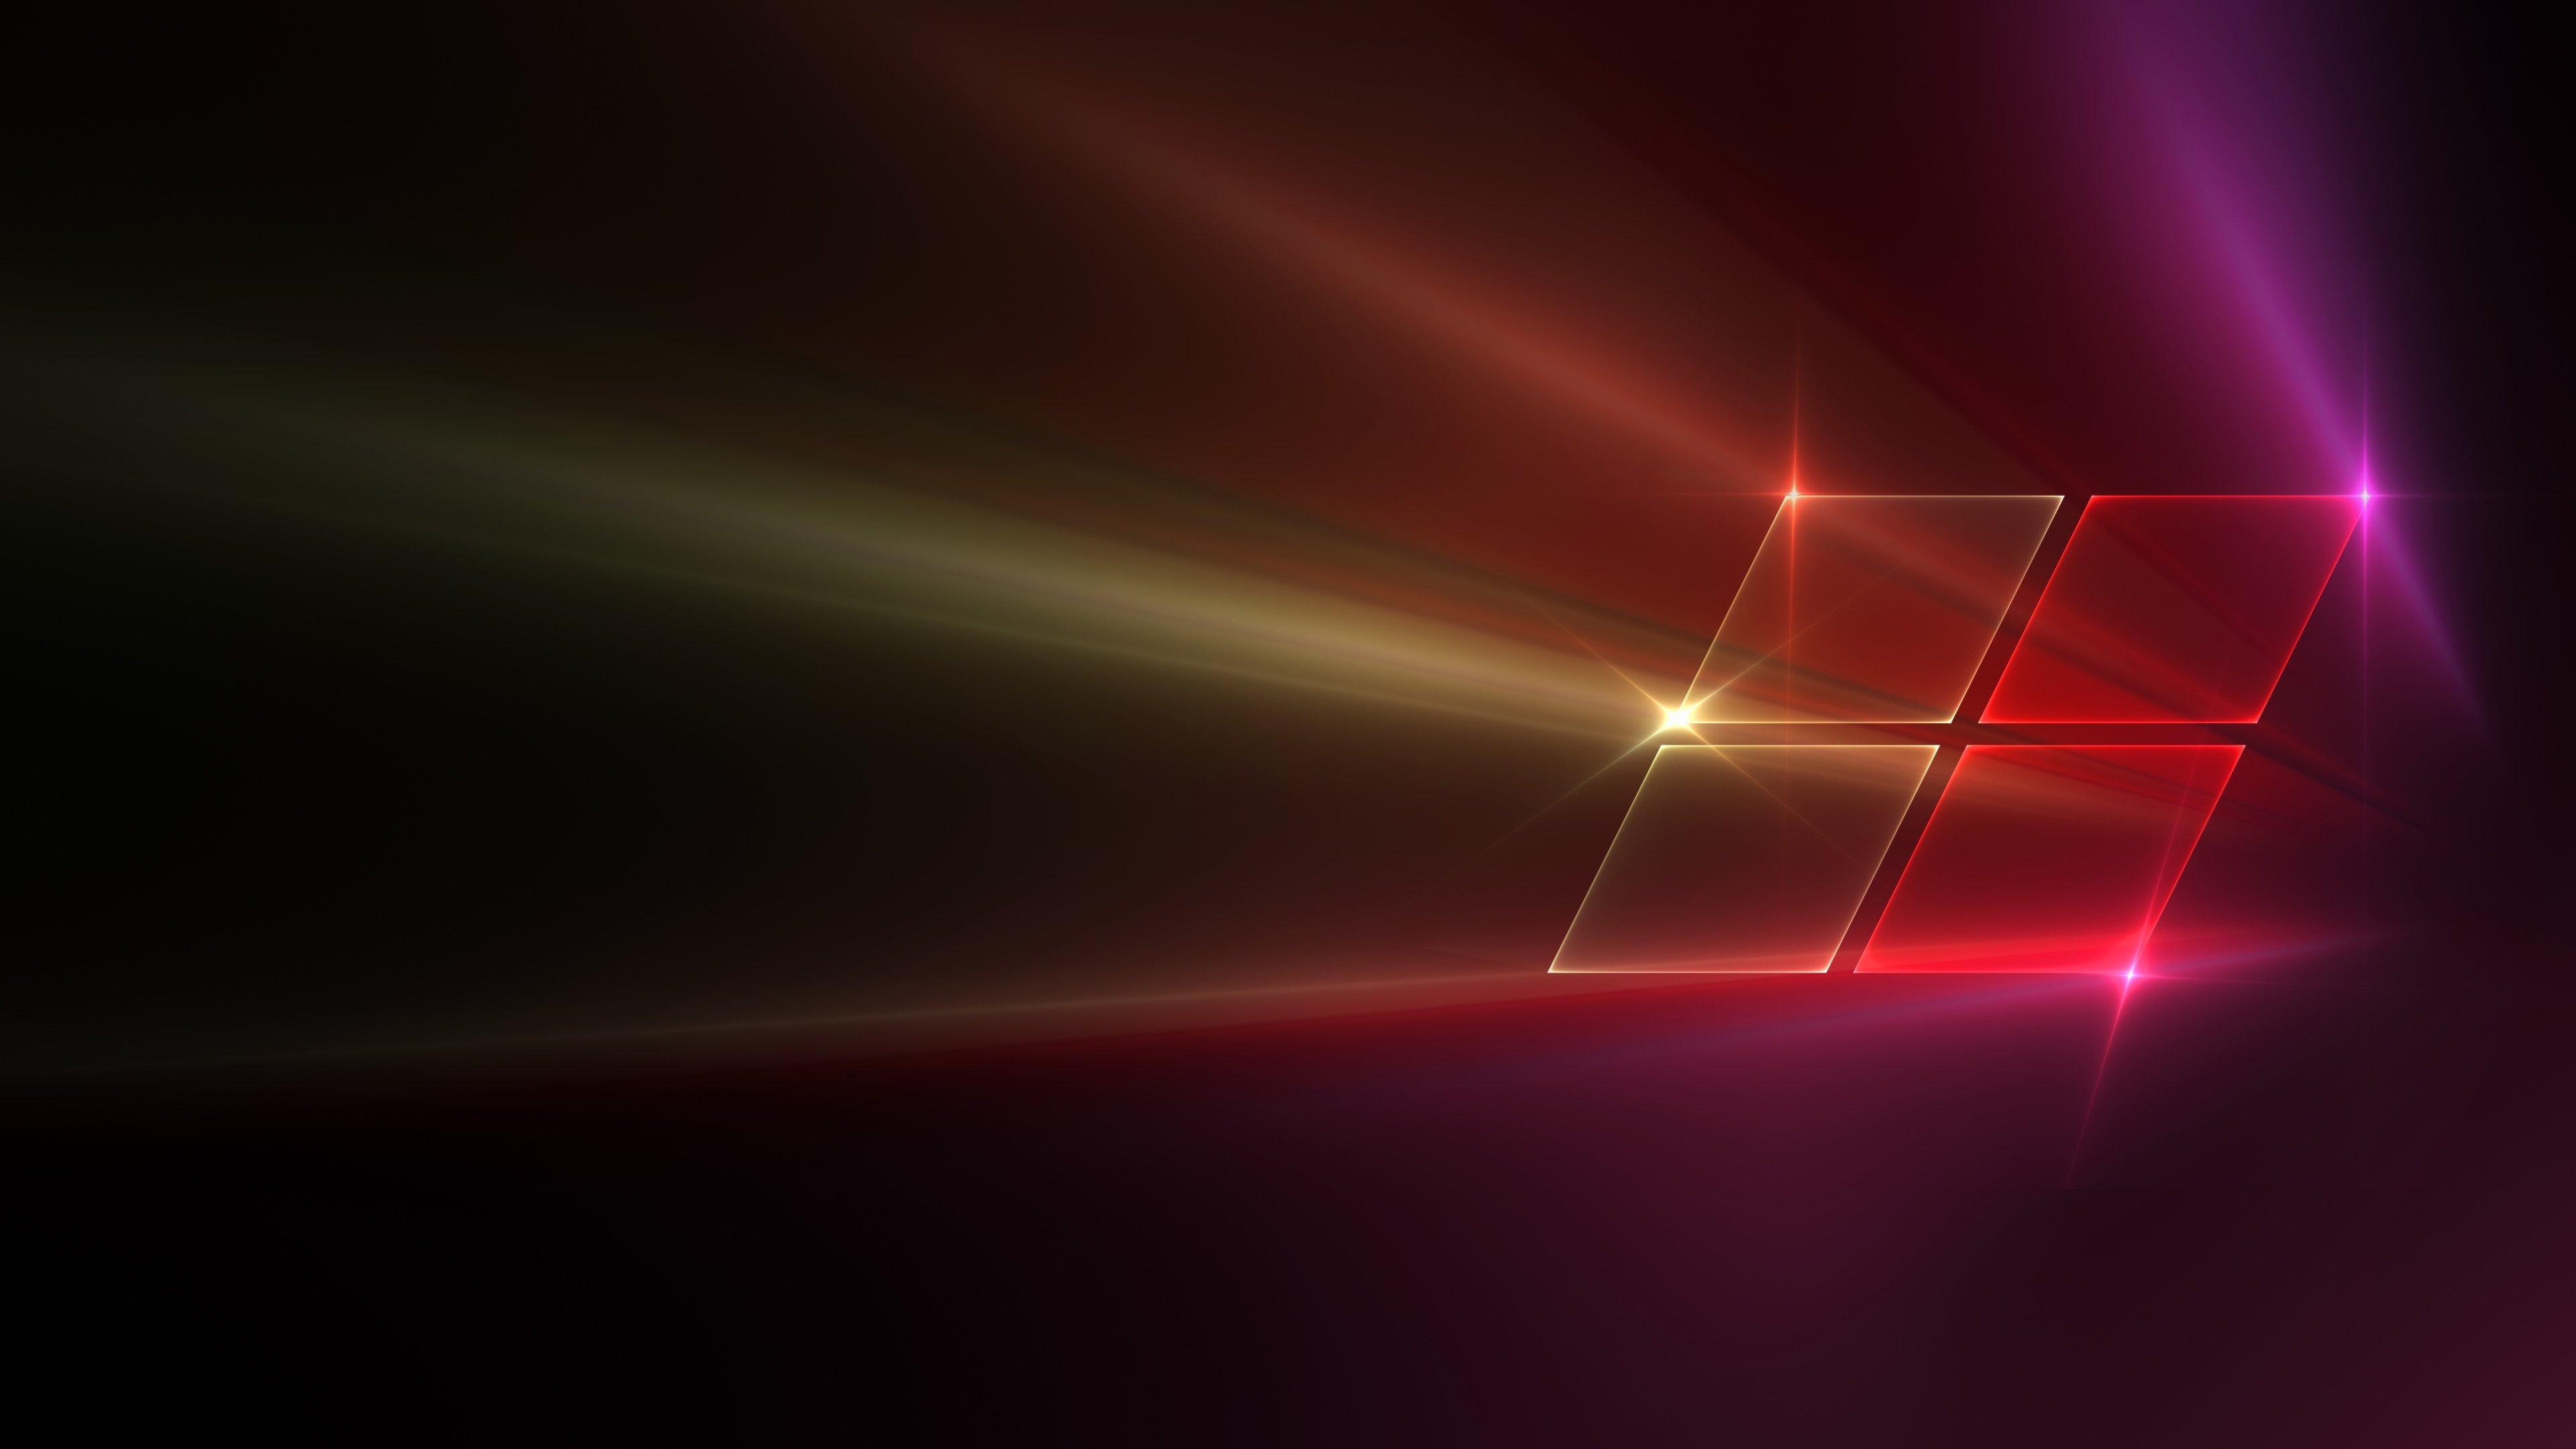 Windows 10 red